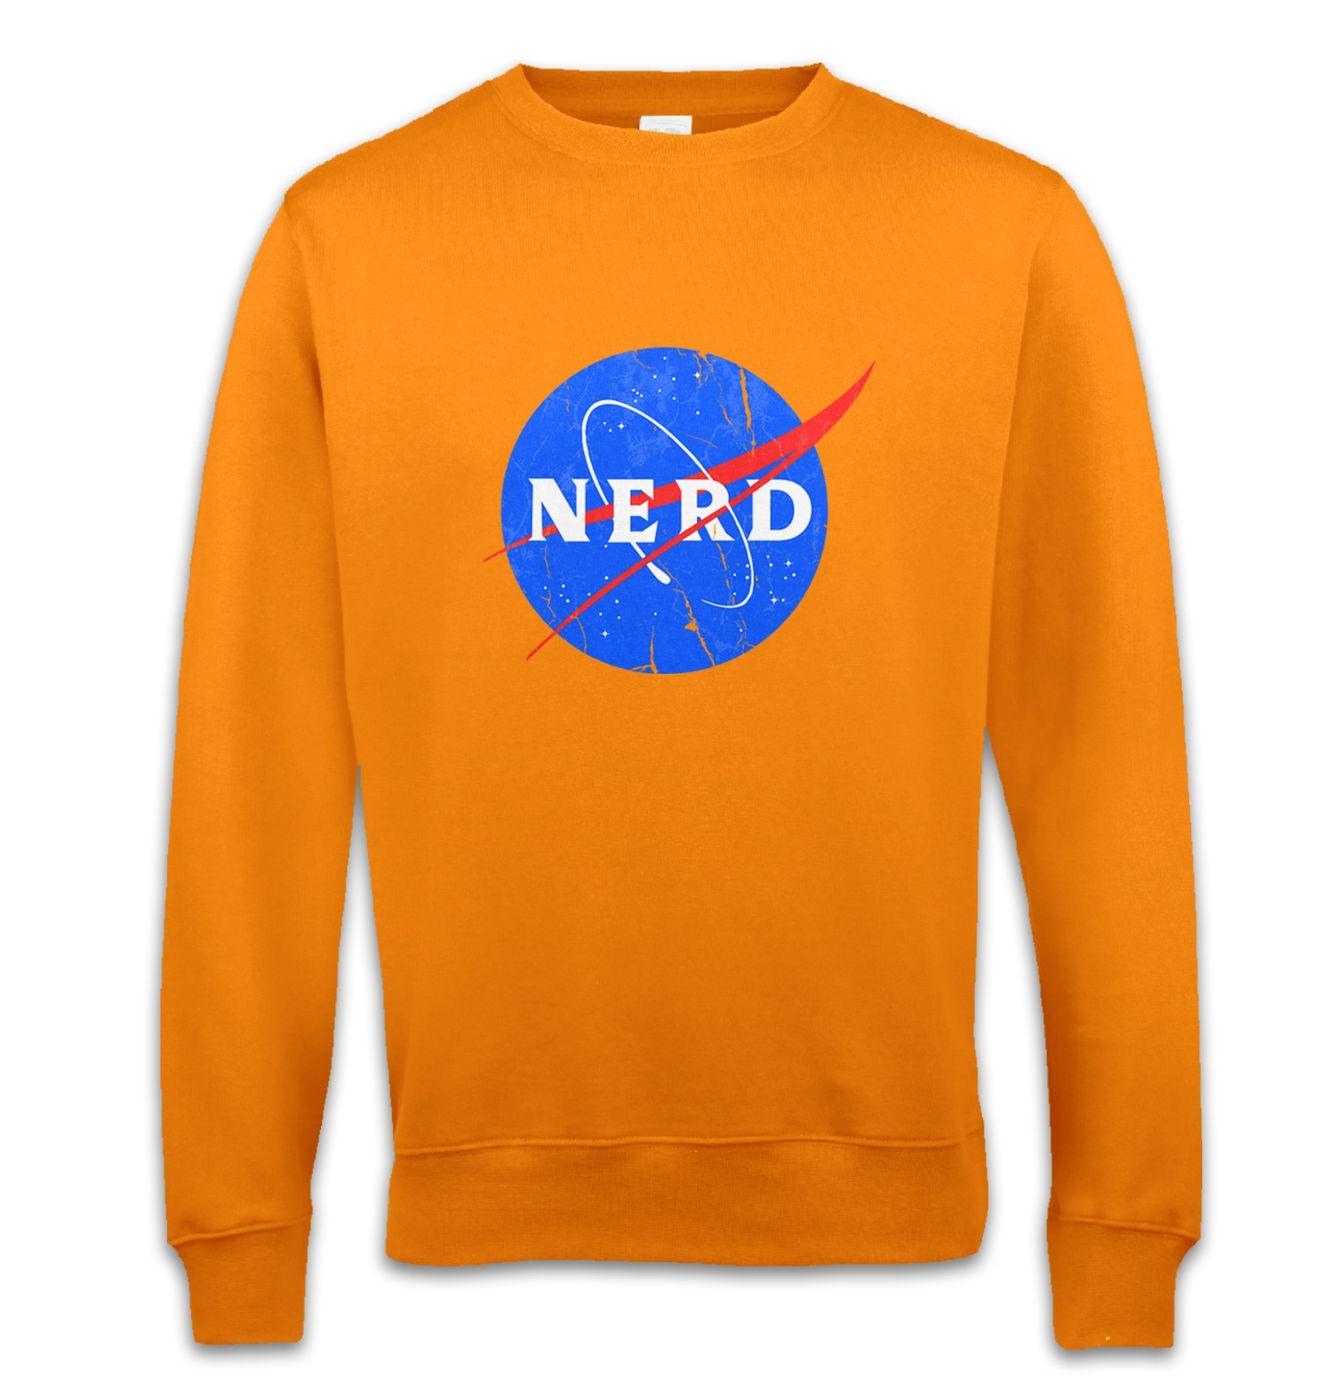 Nerd NASA logo sweatshirt